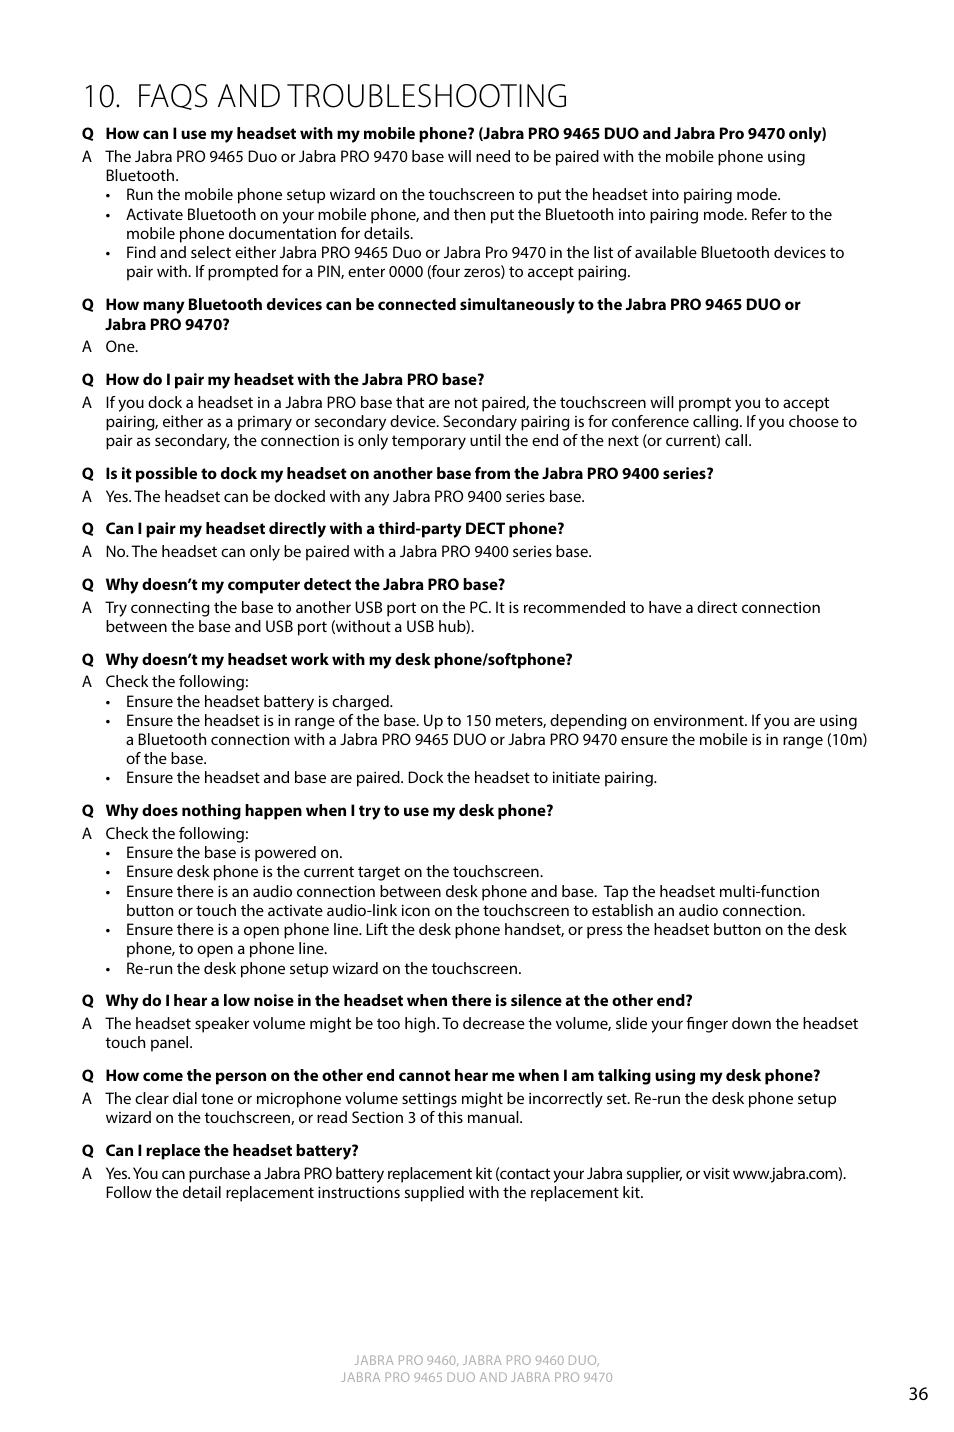 79baf06e9e9 Faqs and troubleshooting, English | Jabra PRO 9470 User Manual User Manual  | Page 35 / 41